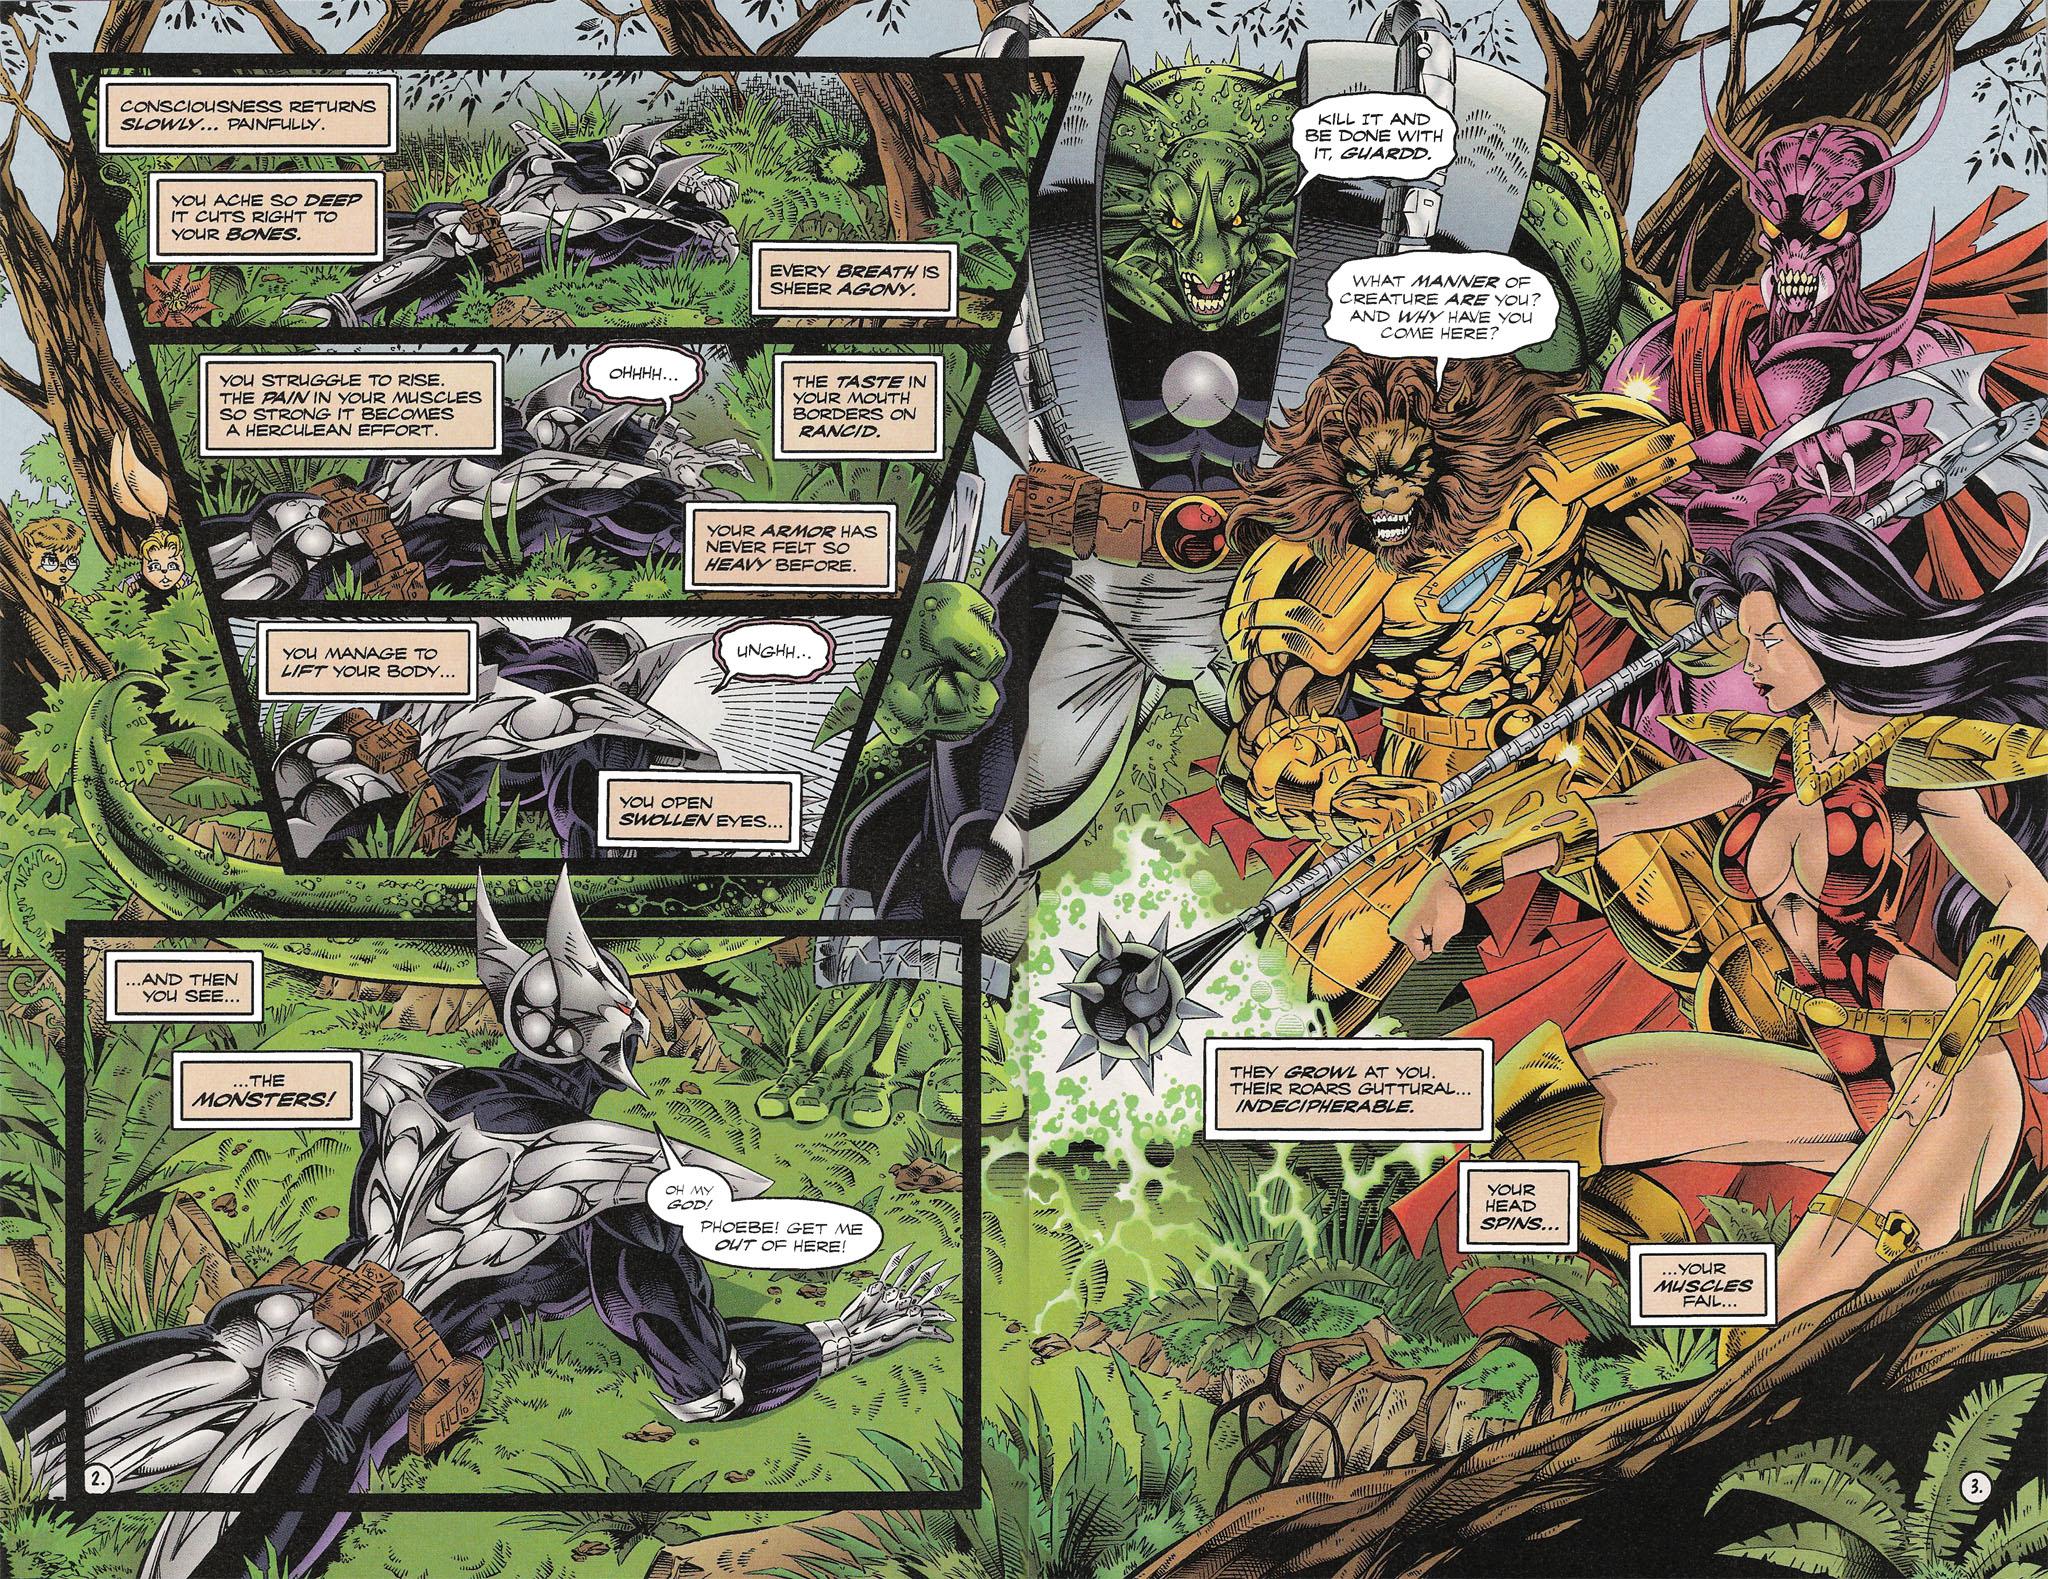 Read online ShadowHawk comic -  Issue #15 - 4